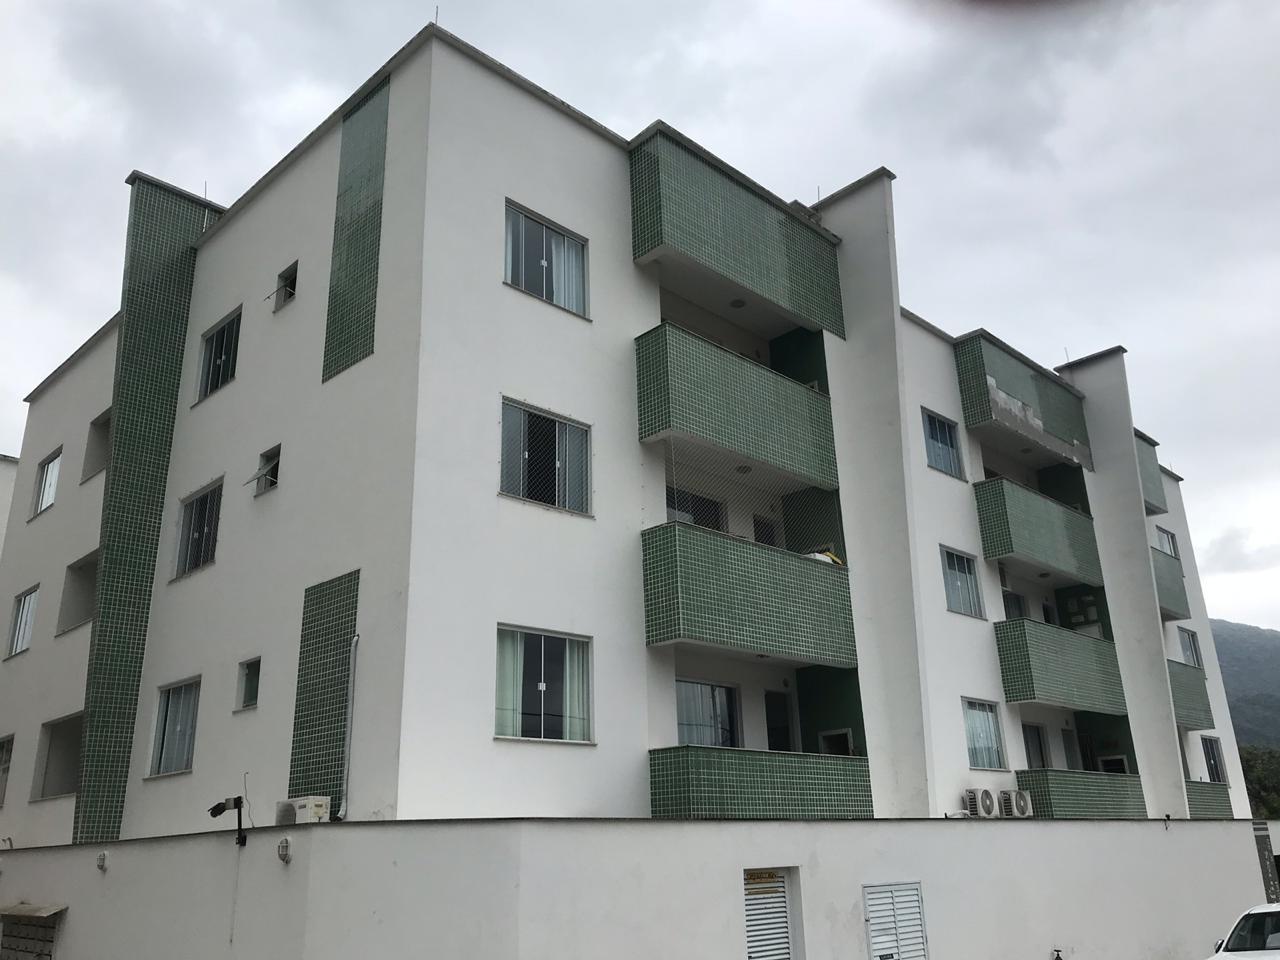 Código: 2867 – Residencial Colinas – Baependi – MI nº 76.429